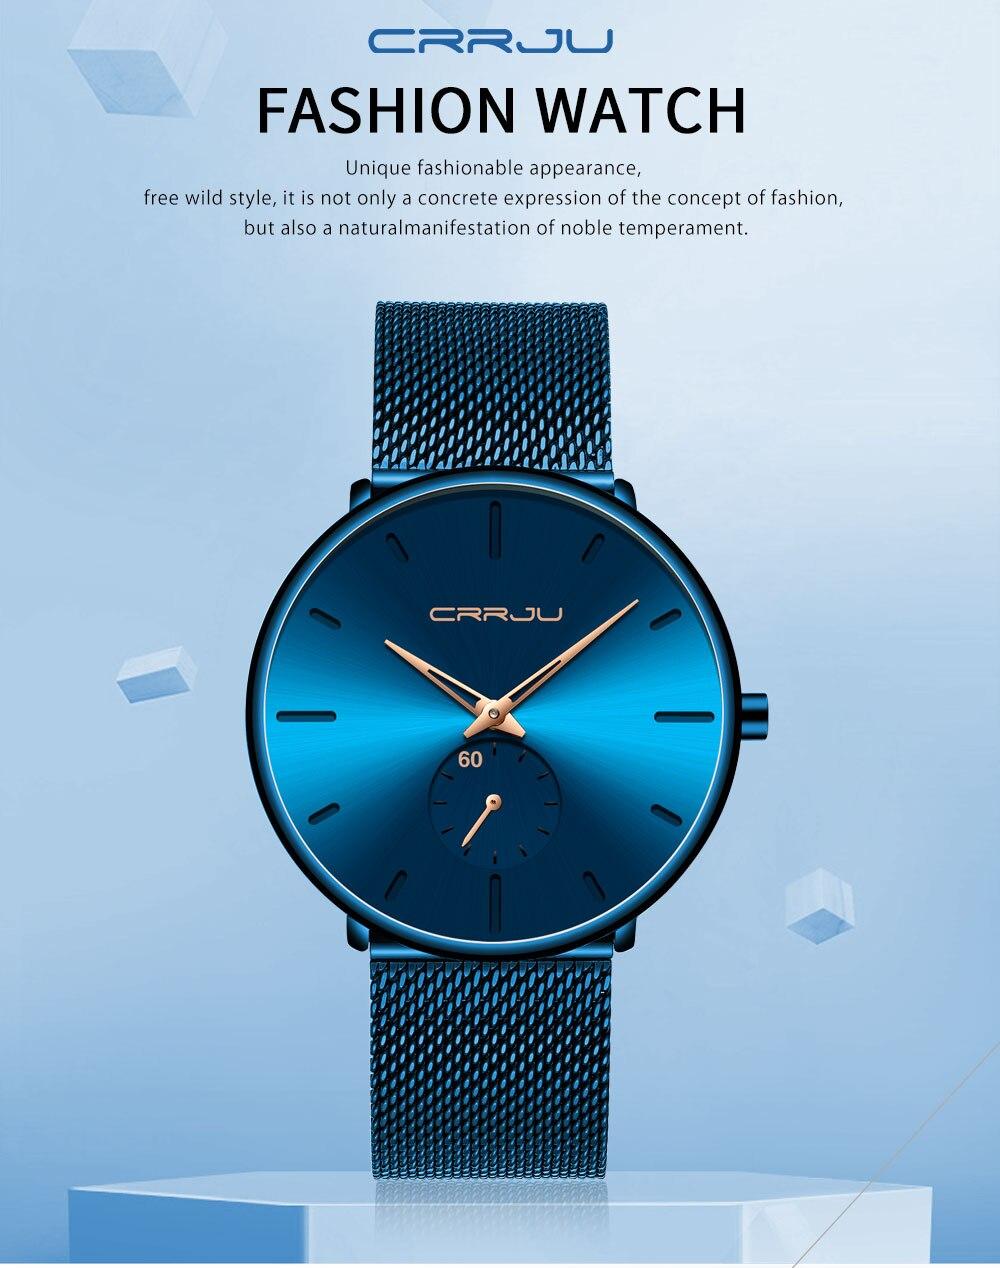 He4a5100c917e444ca5d92d9b64e37671B CRRJU Ultra Thin Blue Stainless steel Quartz Watches Men Simple Fashion Business Japan Wristwatch Clock Male Relogio Masculino